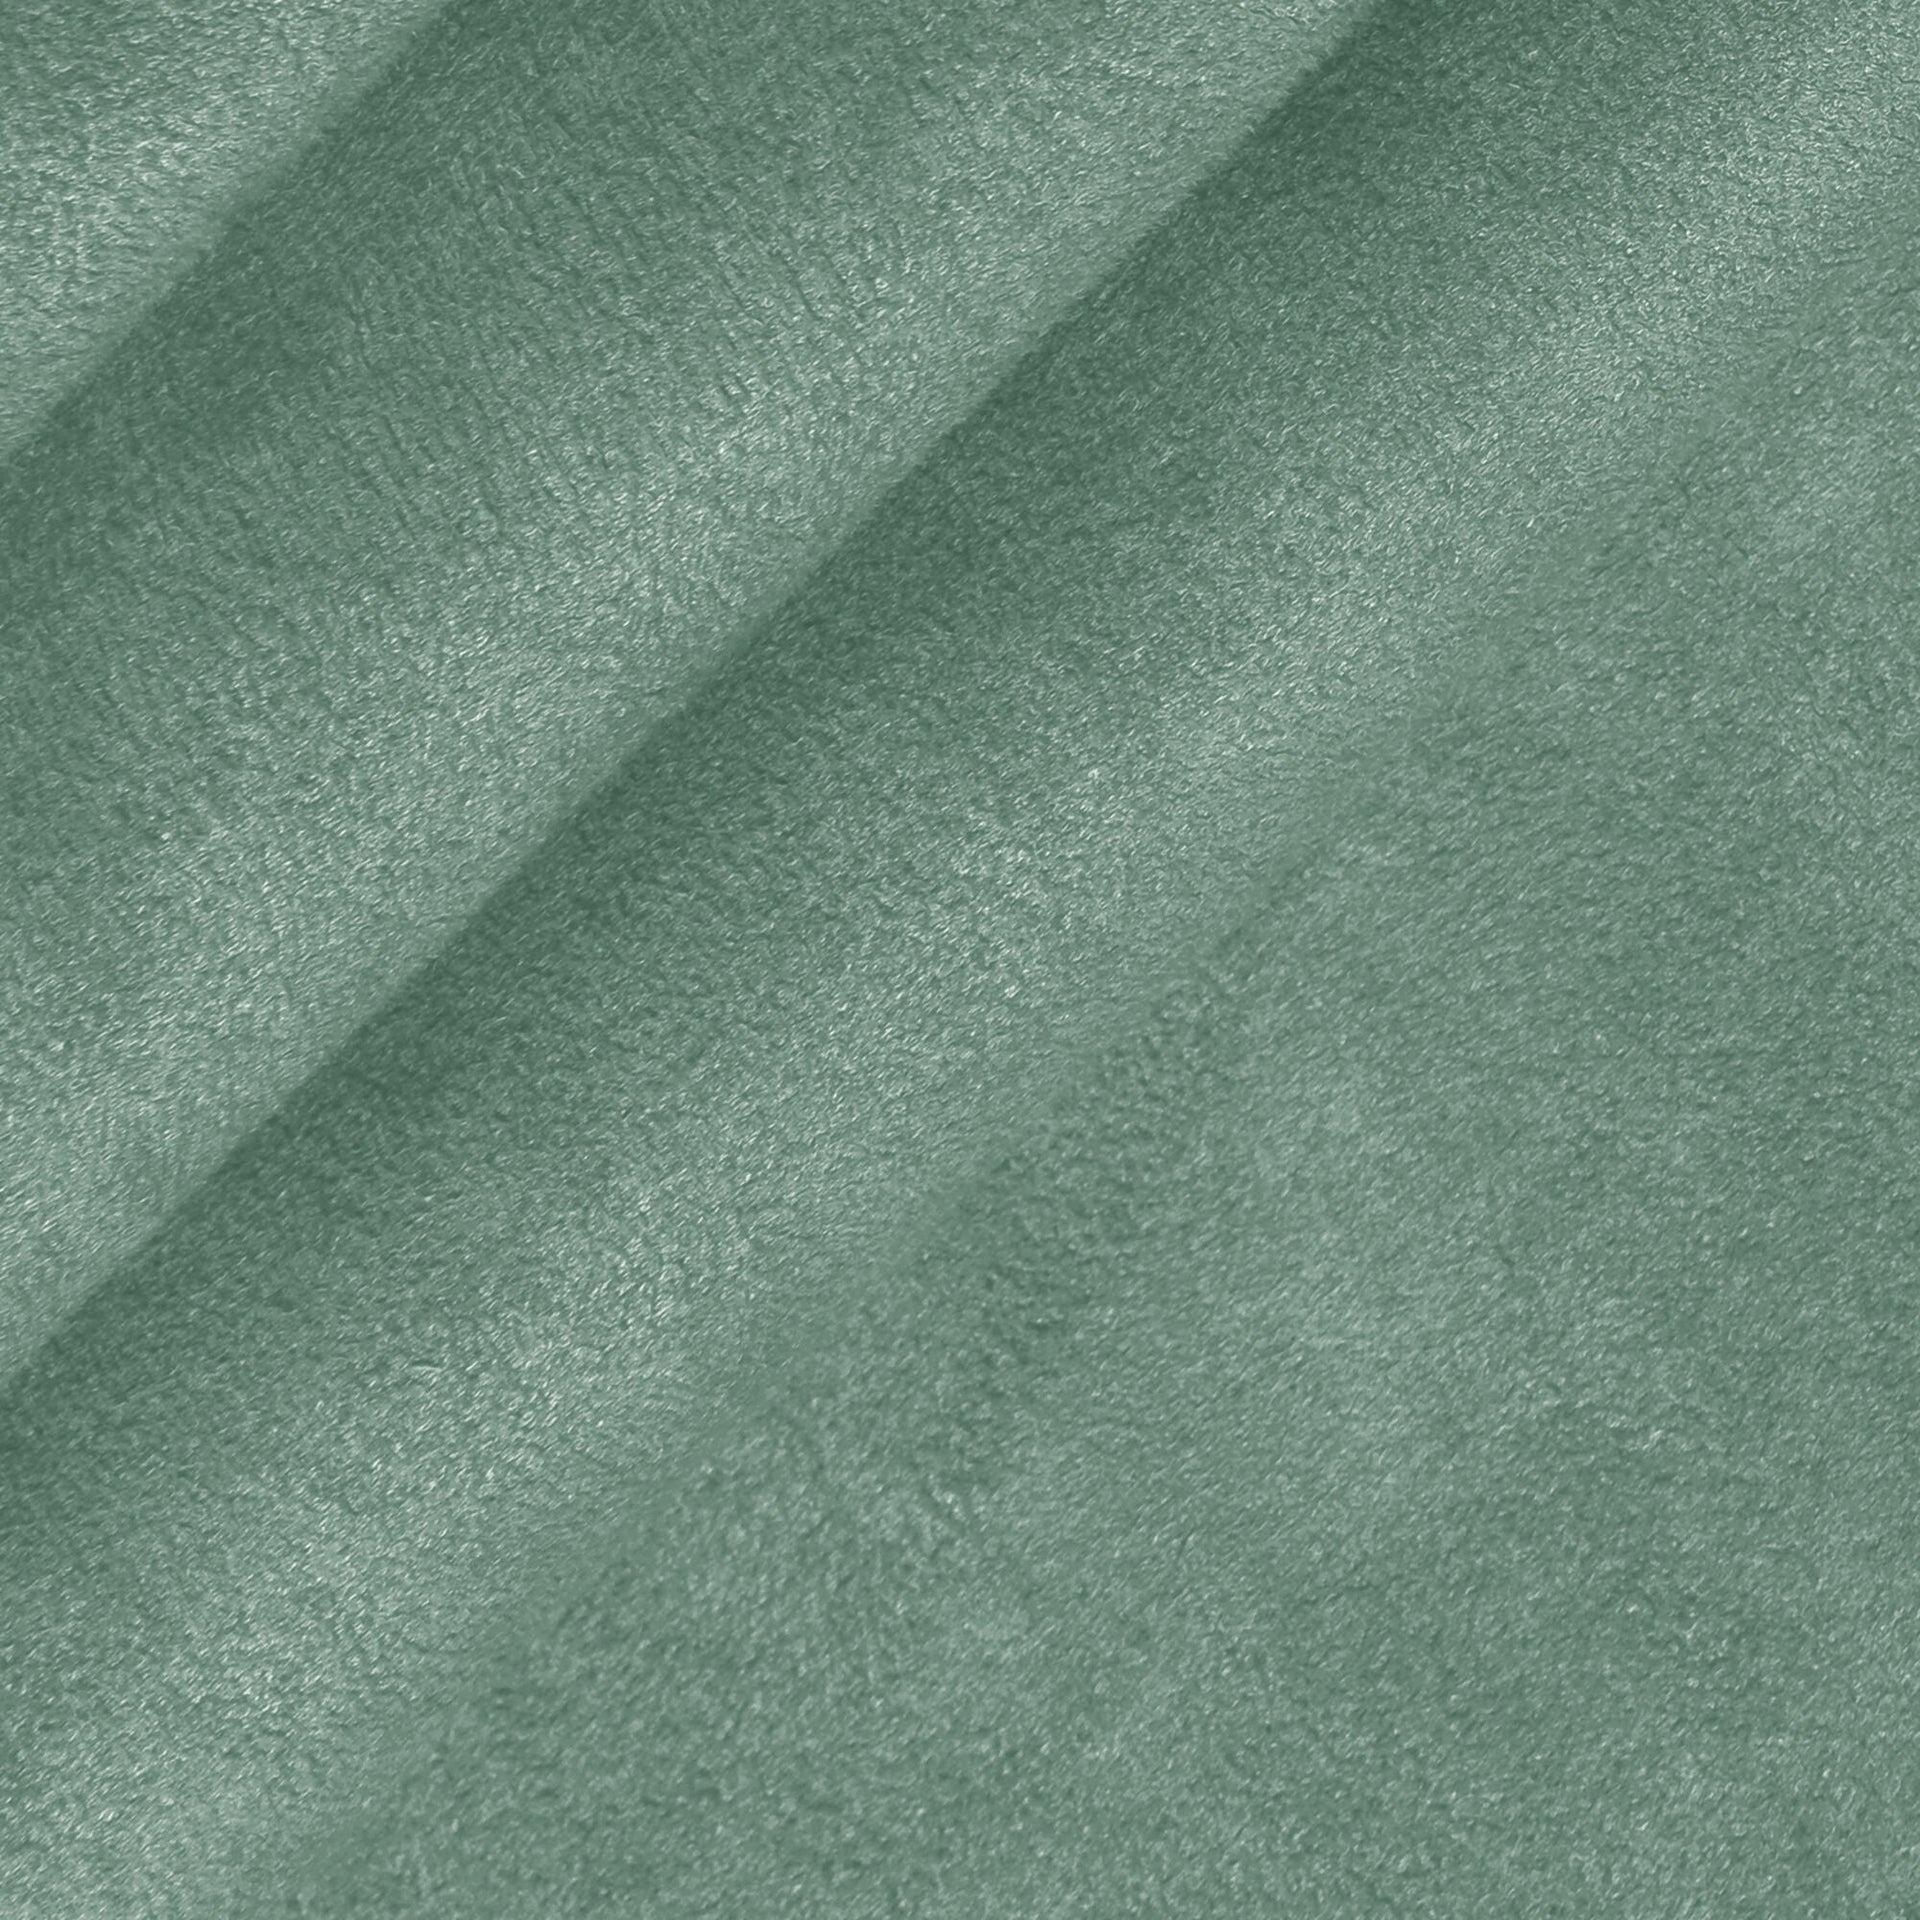 Tenda INSPIRE New Manchester verde occhielli 140 x 280 cm - 2